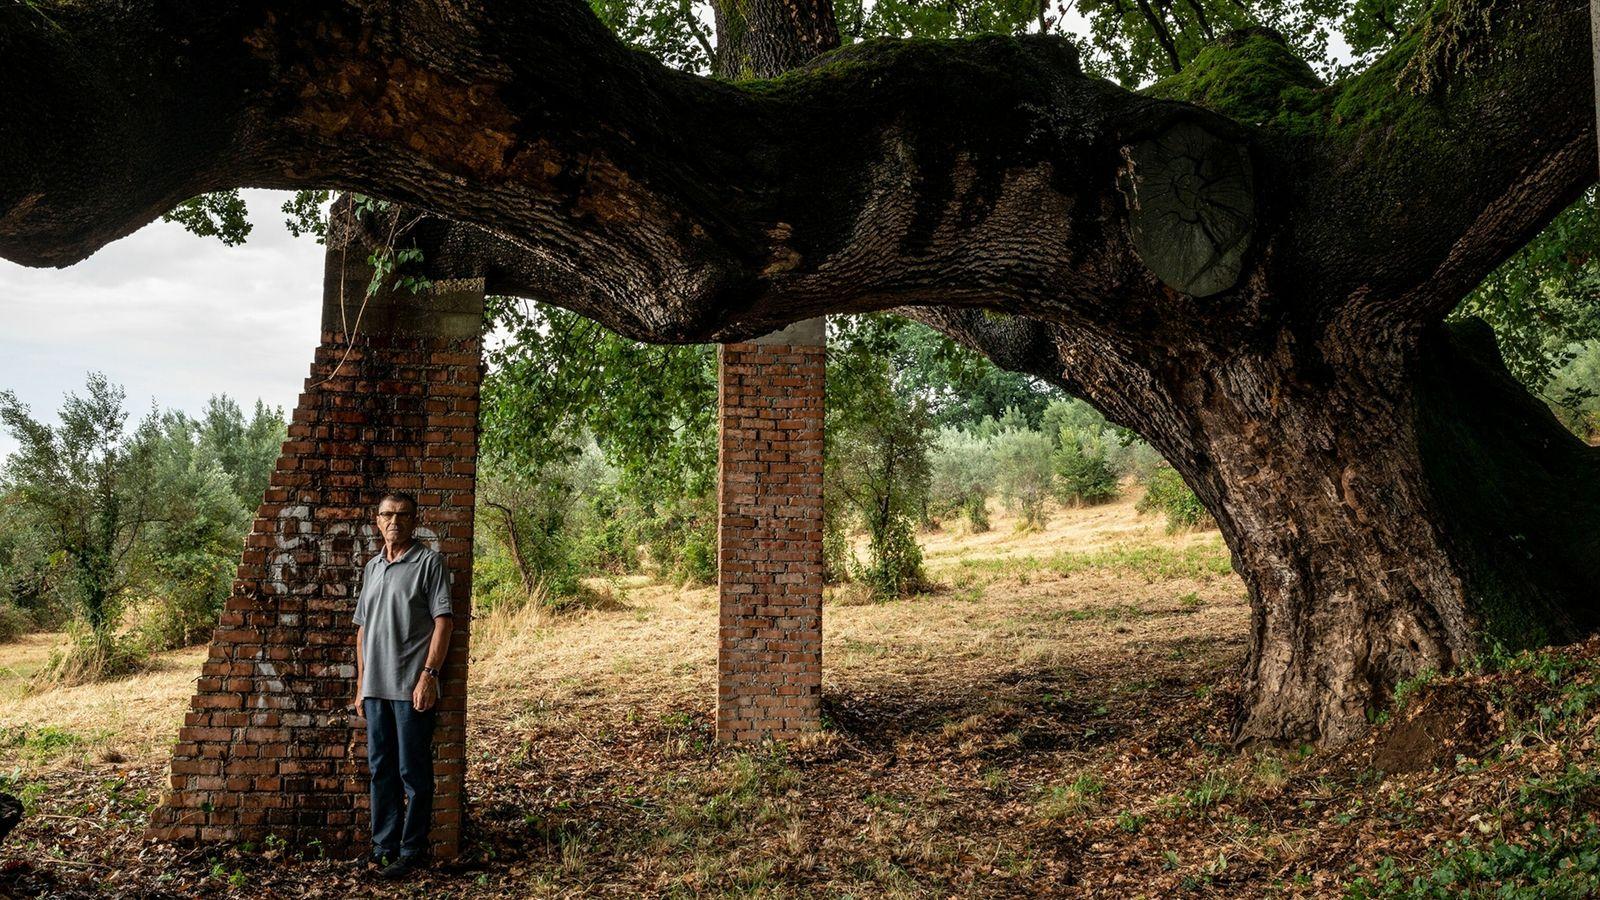 monumental-oak-person